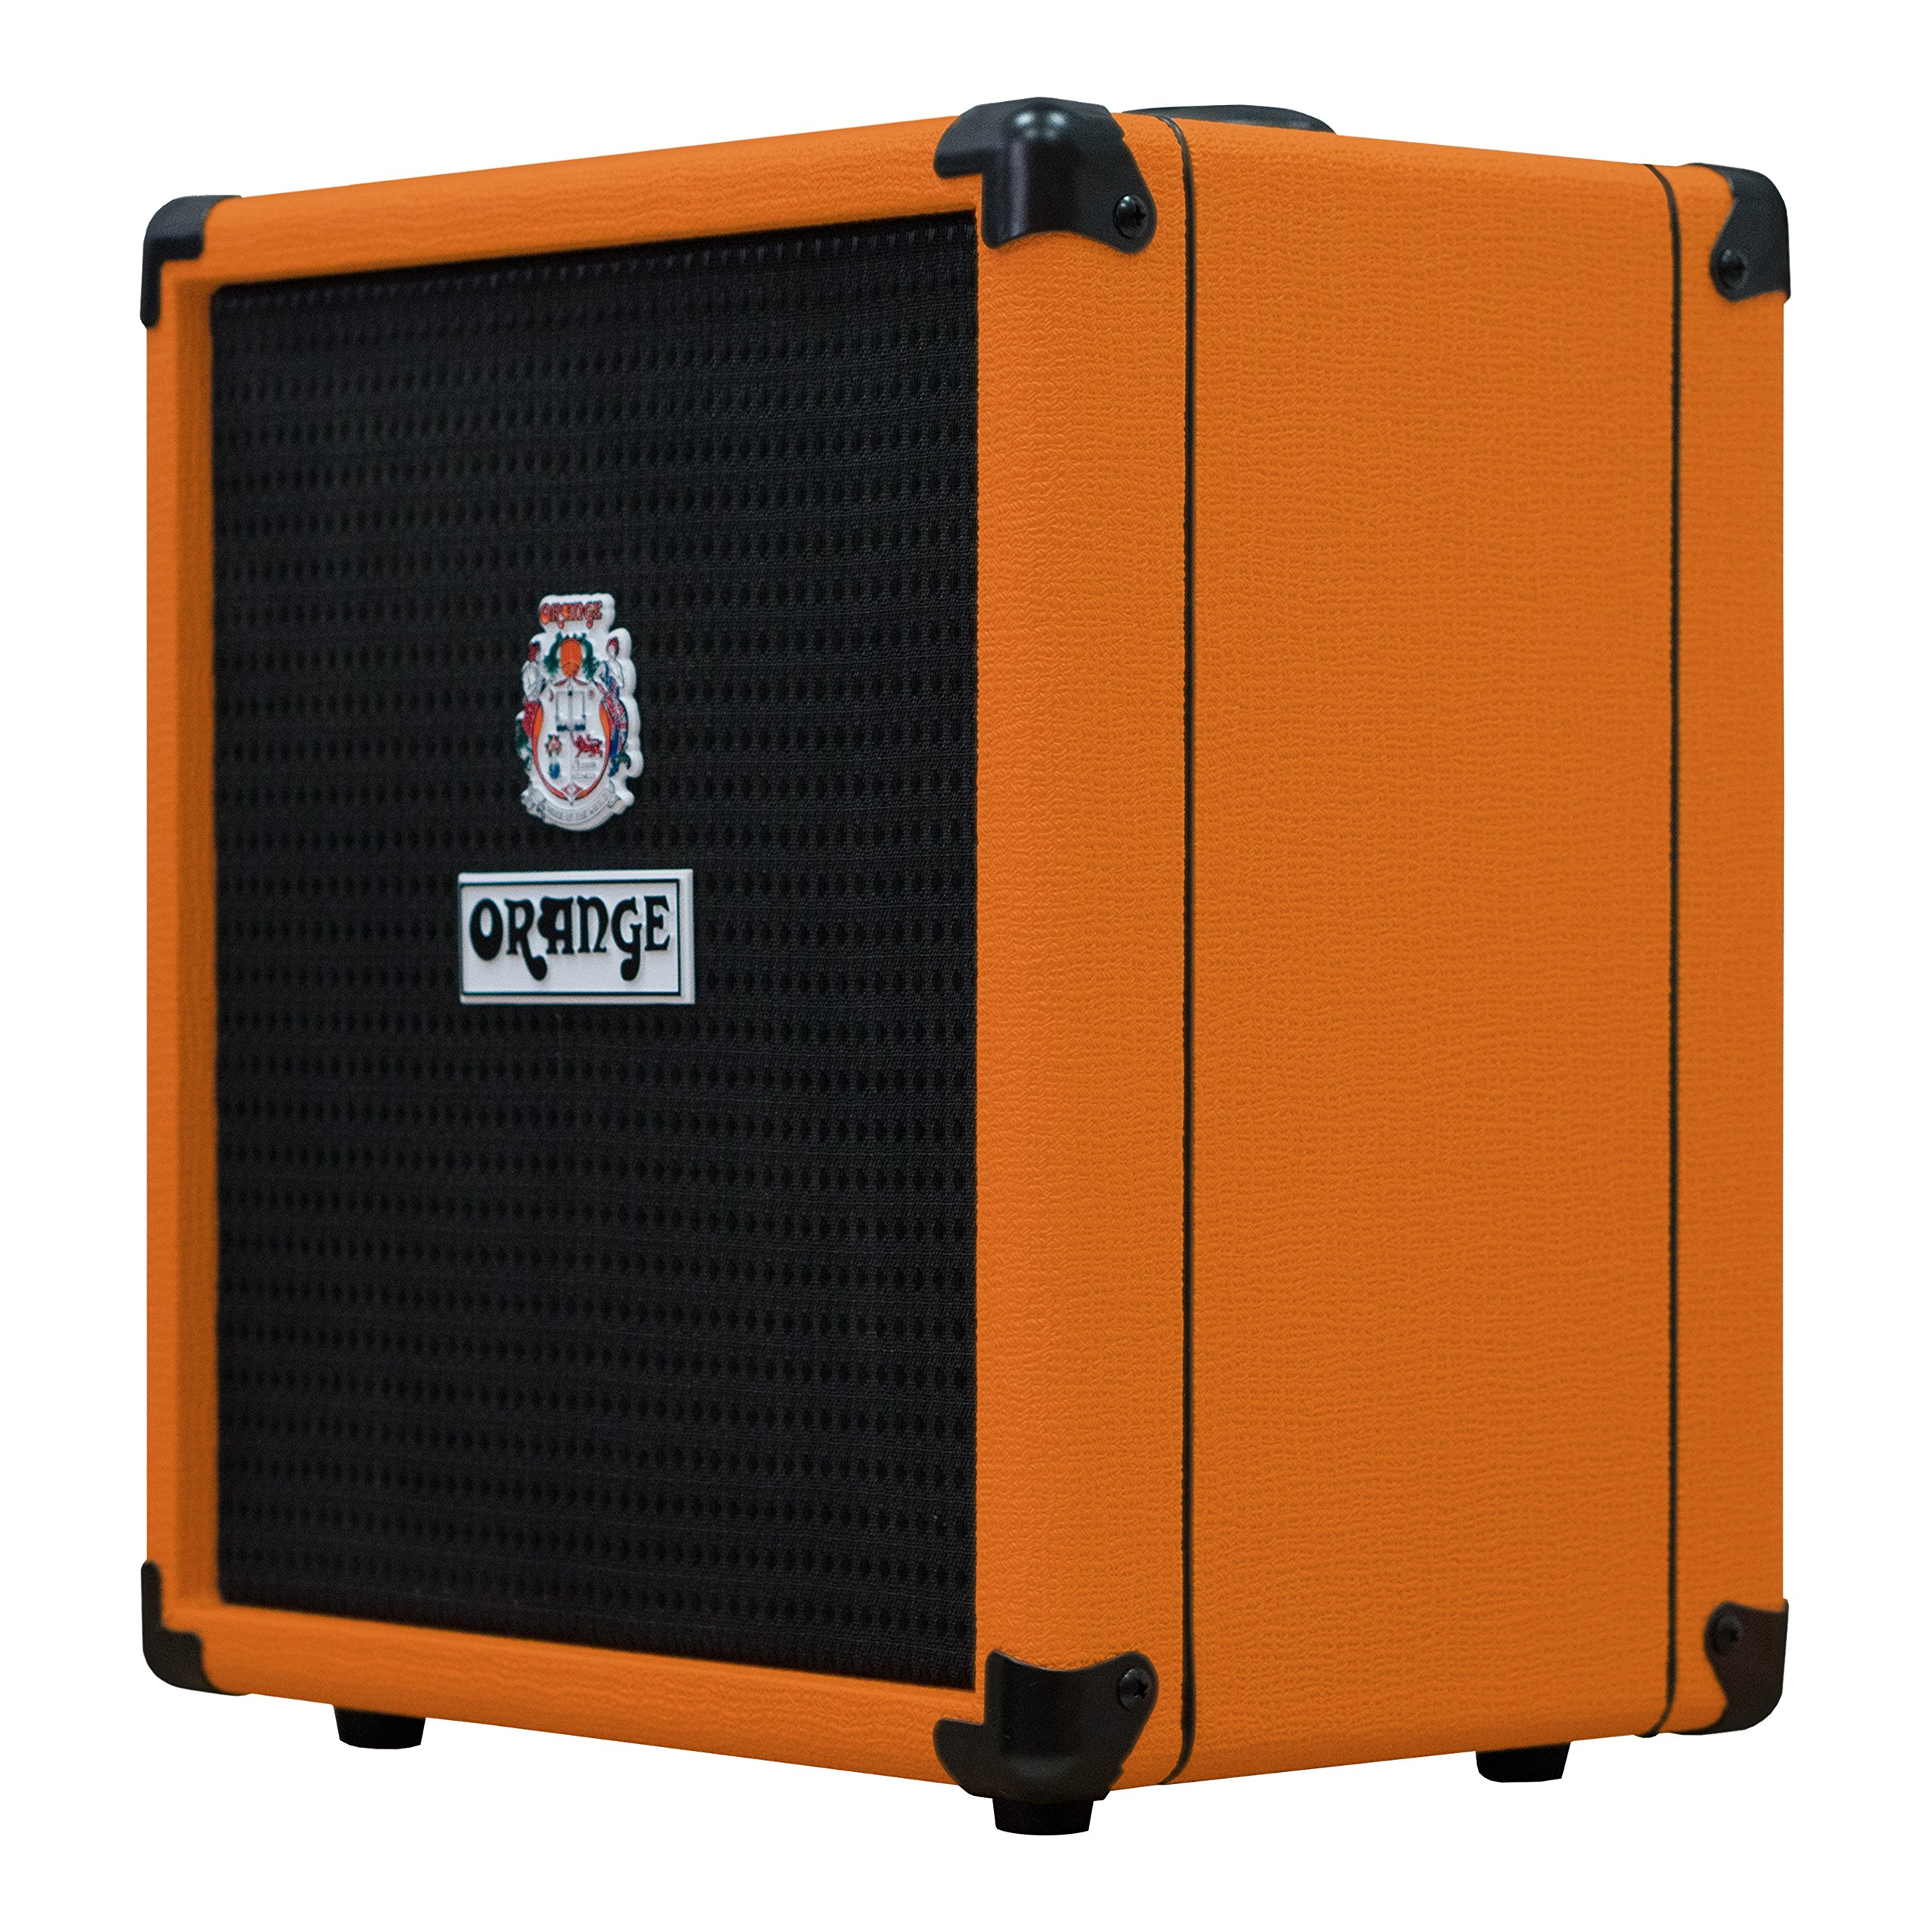 Orange Crush Bass 25W Bass Guitar Combo Amp, Orange by Orange Amps (Image #7)